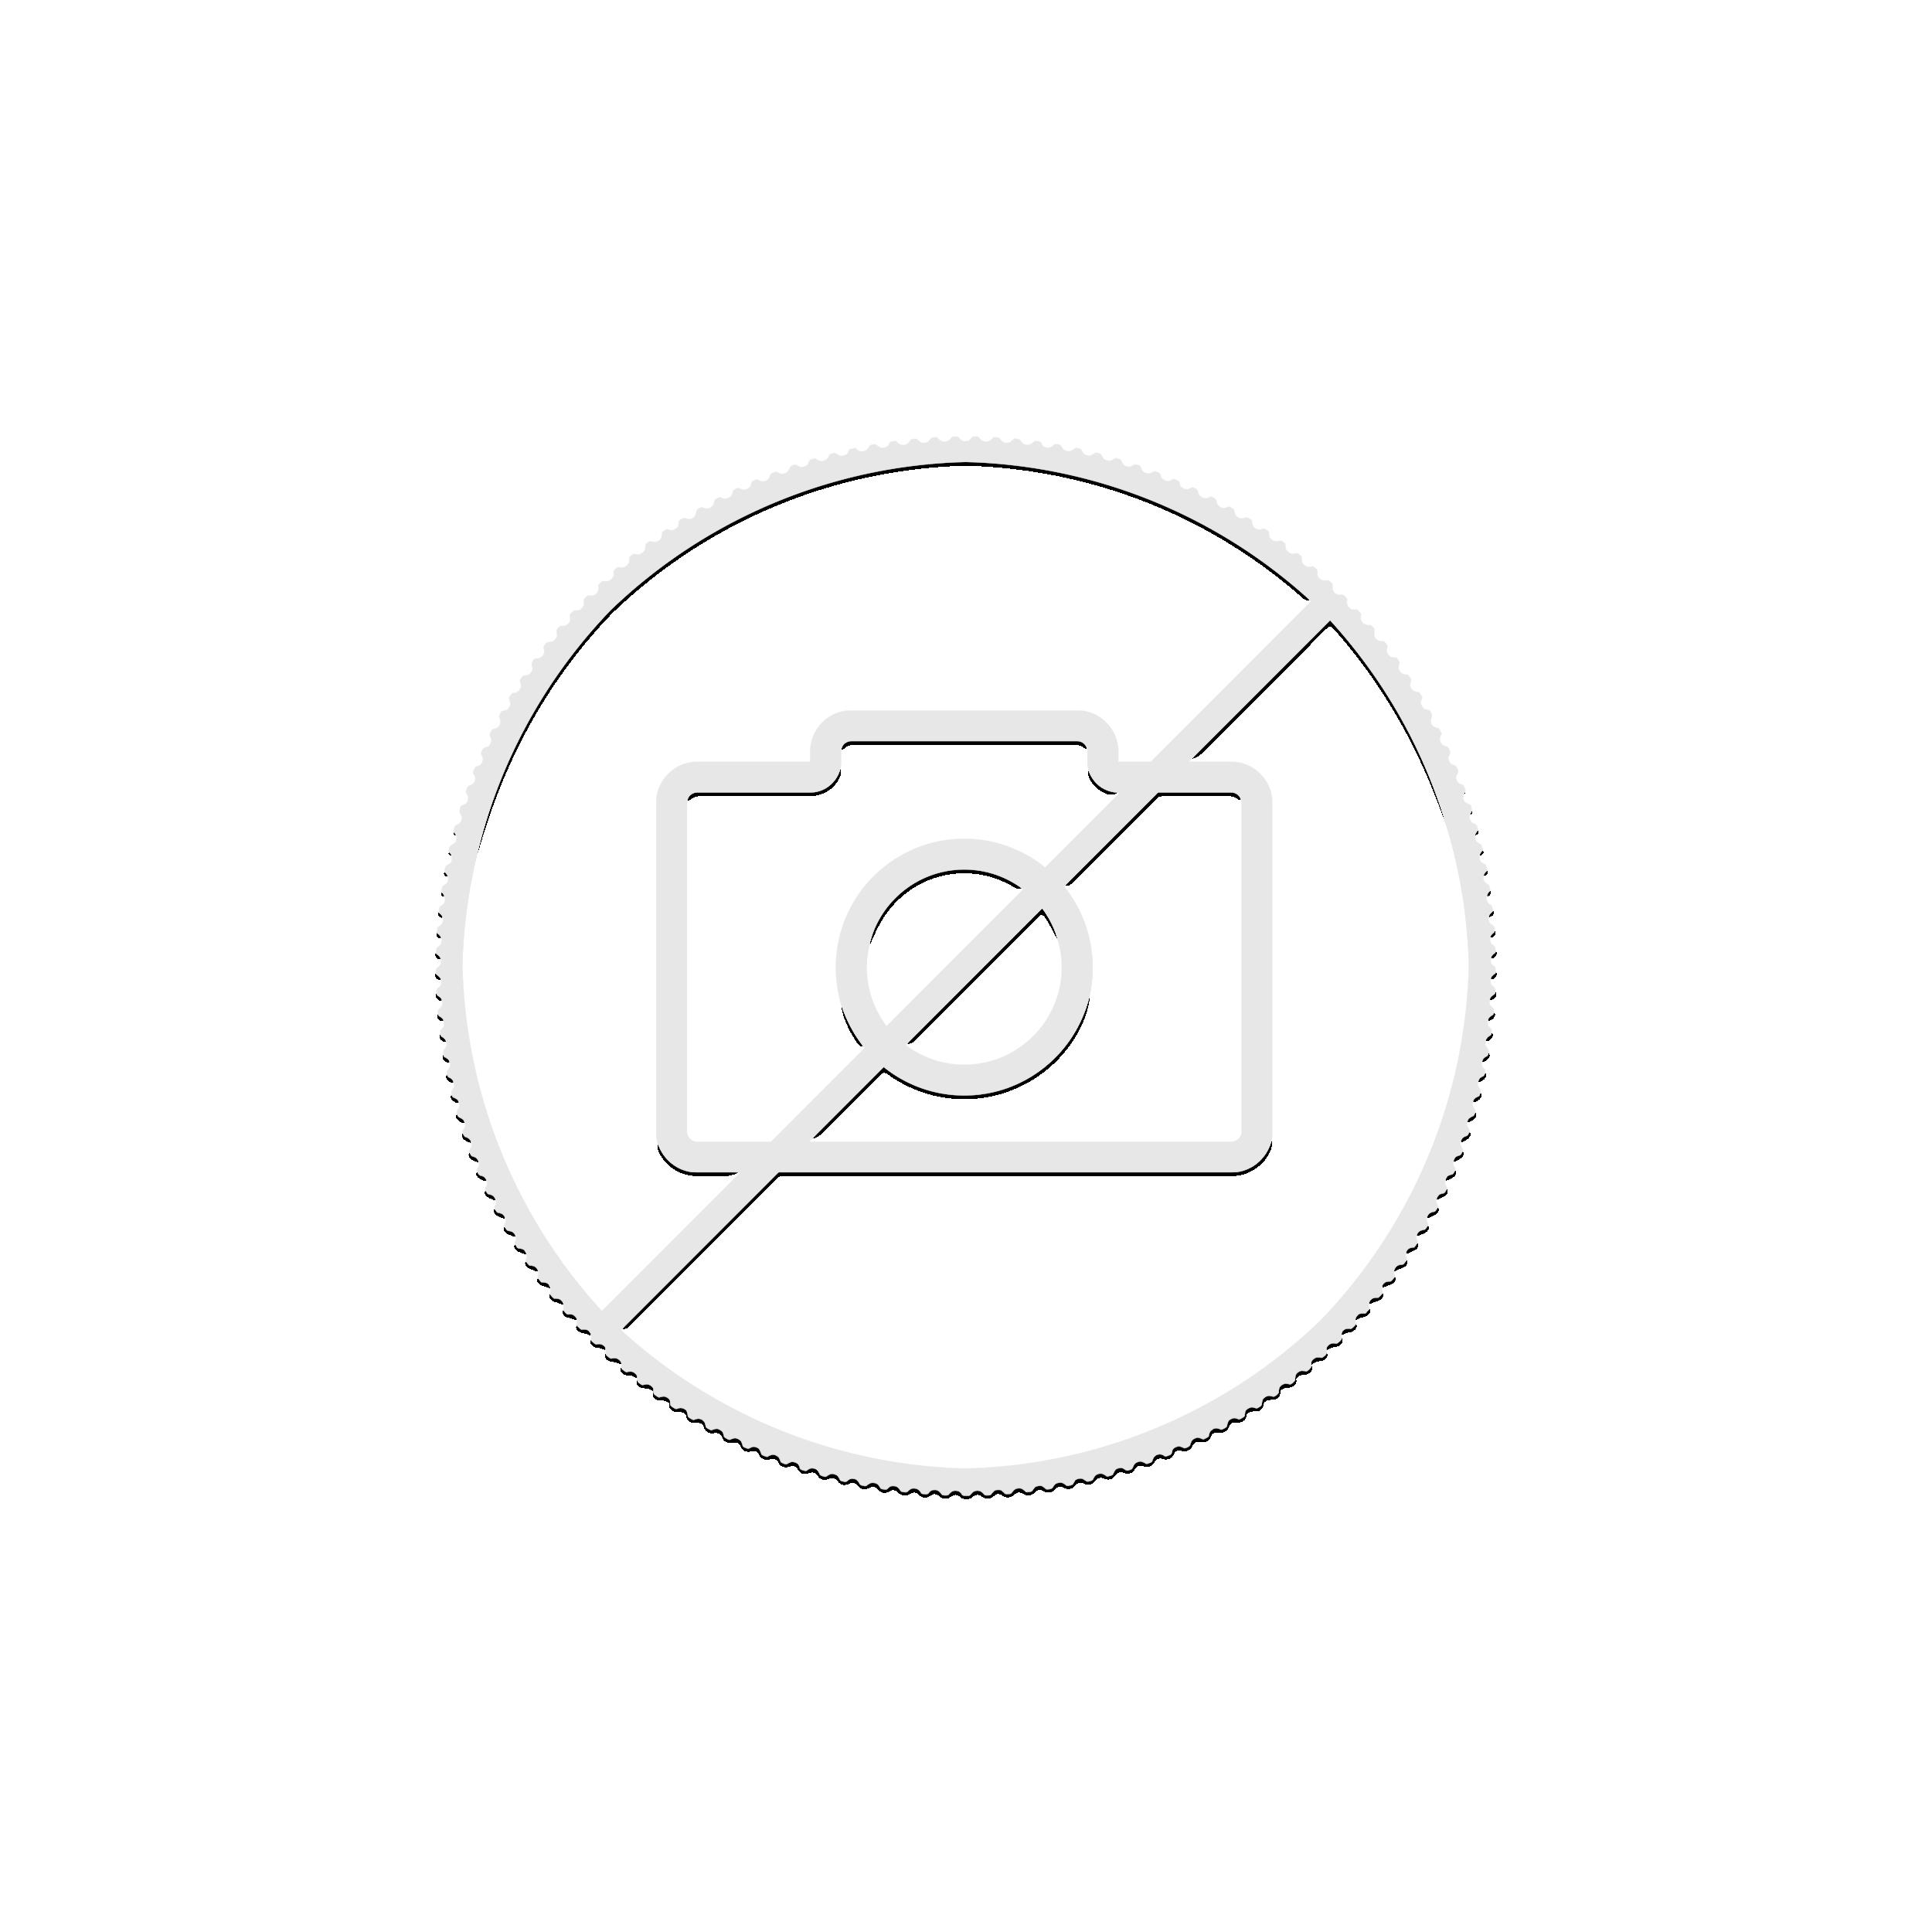 20121 Kilogram silver coin Lunar